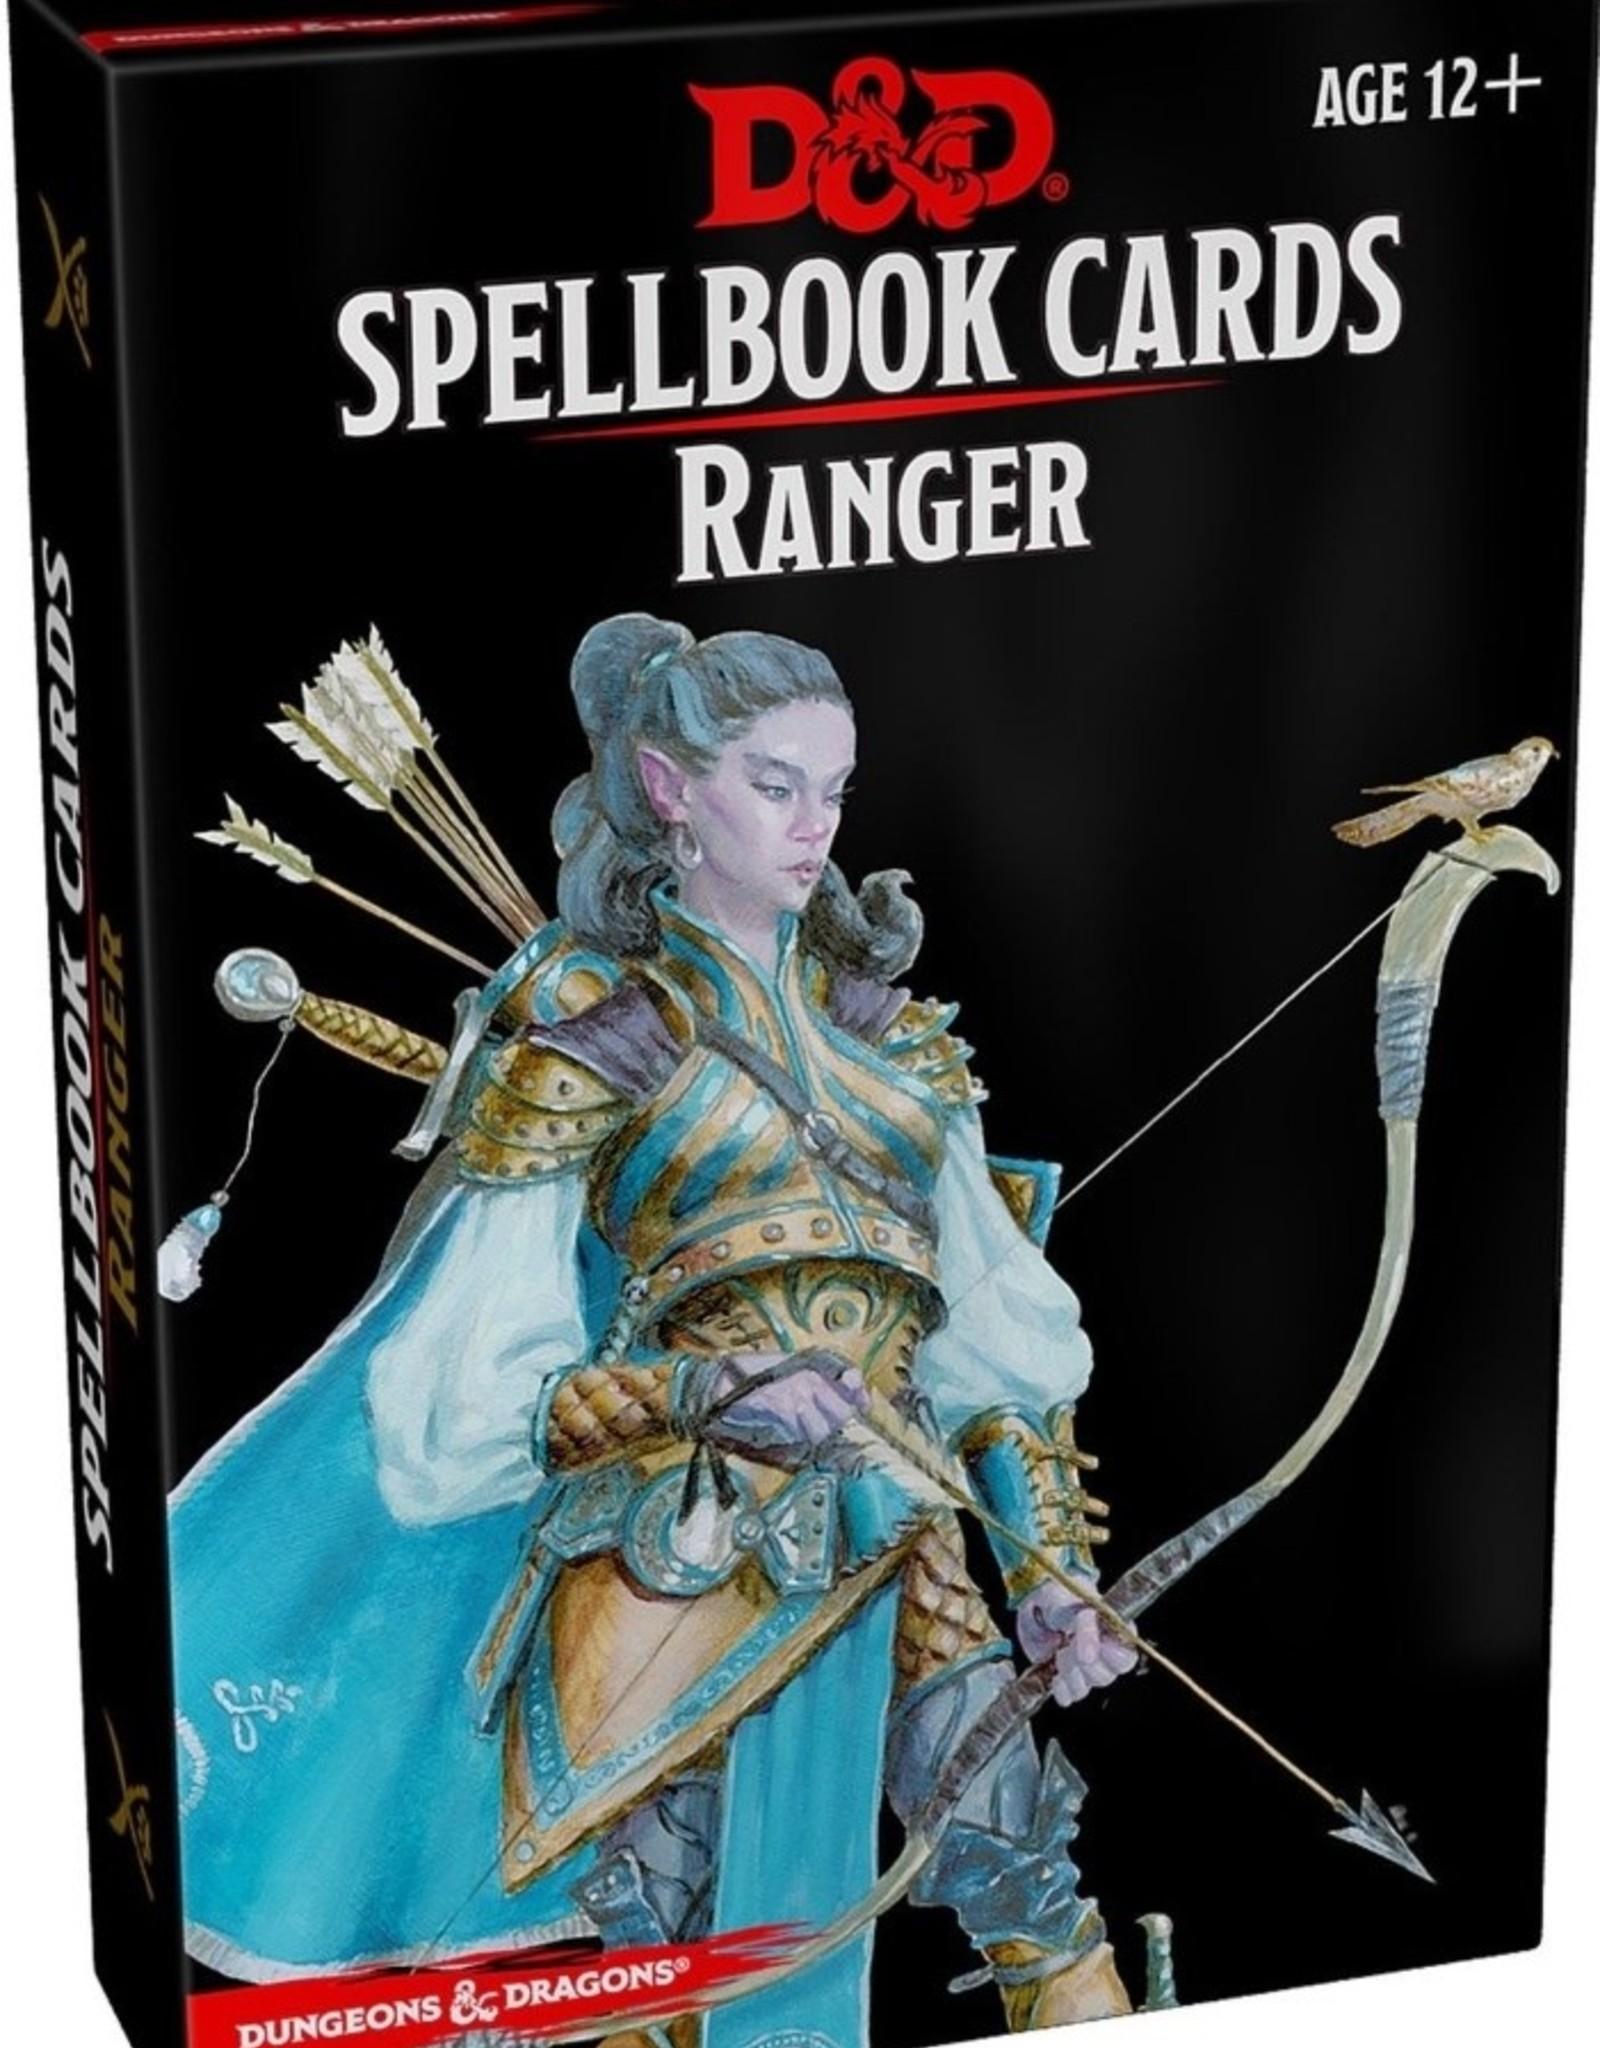 Gale Force Nine D&D 5th ed. Spellbook Cards Ranger